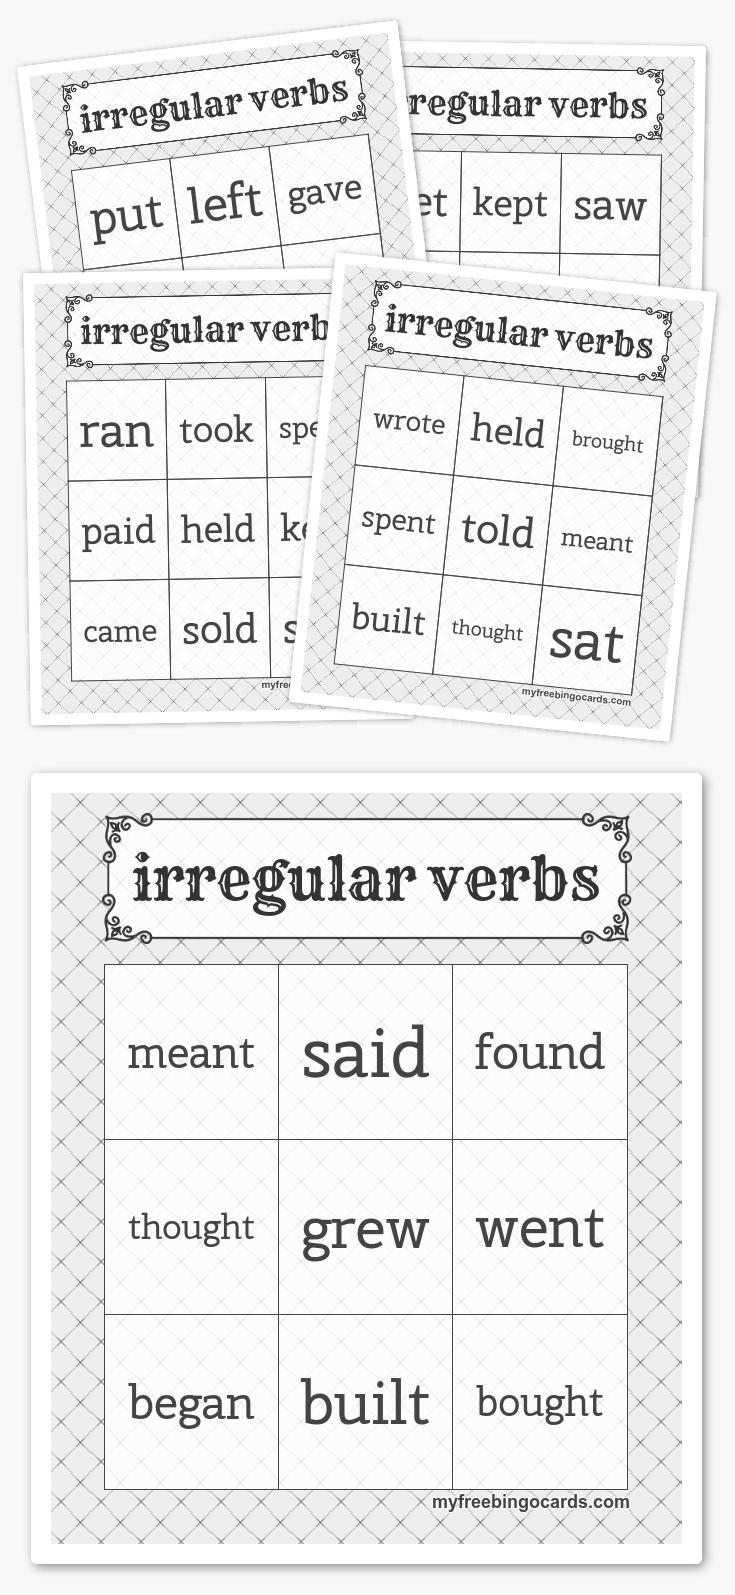 Irregular Verbs Bingo Bingo Cards Free Printable Bingo Cards Free Bingo Cards [ 1595 x 735 Pixel ]